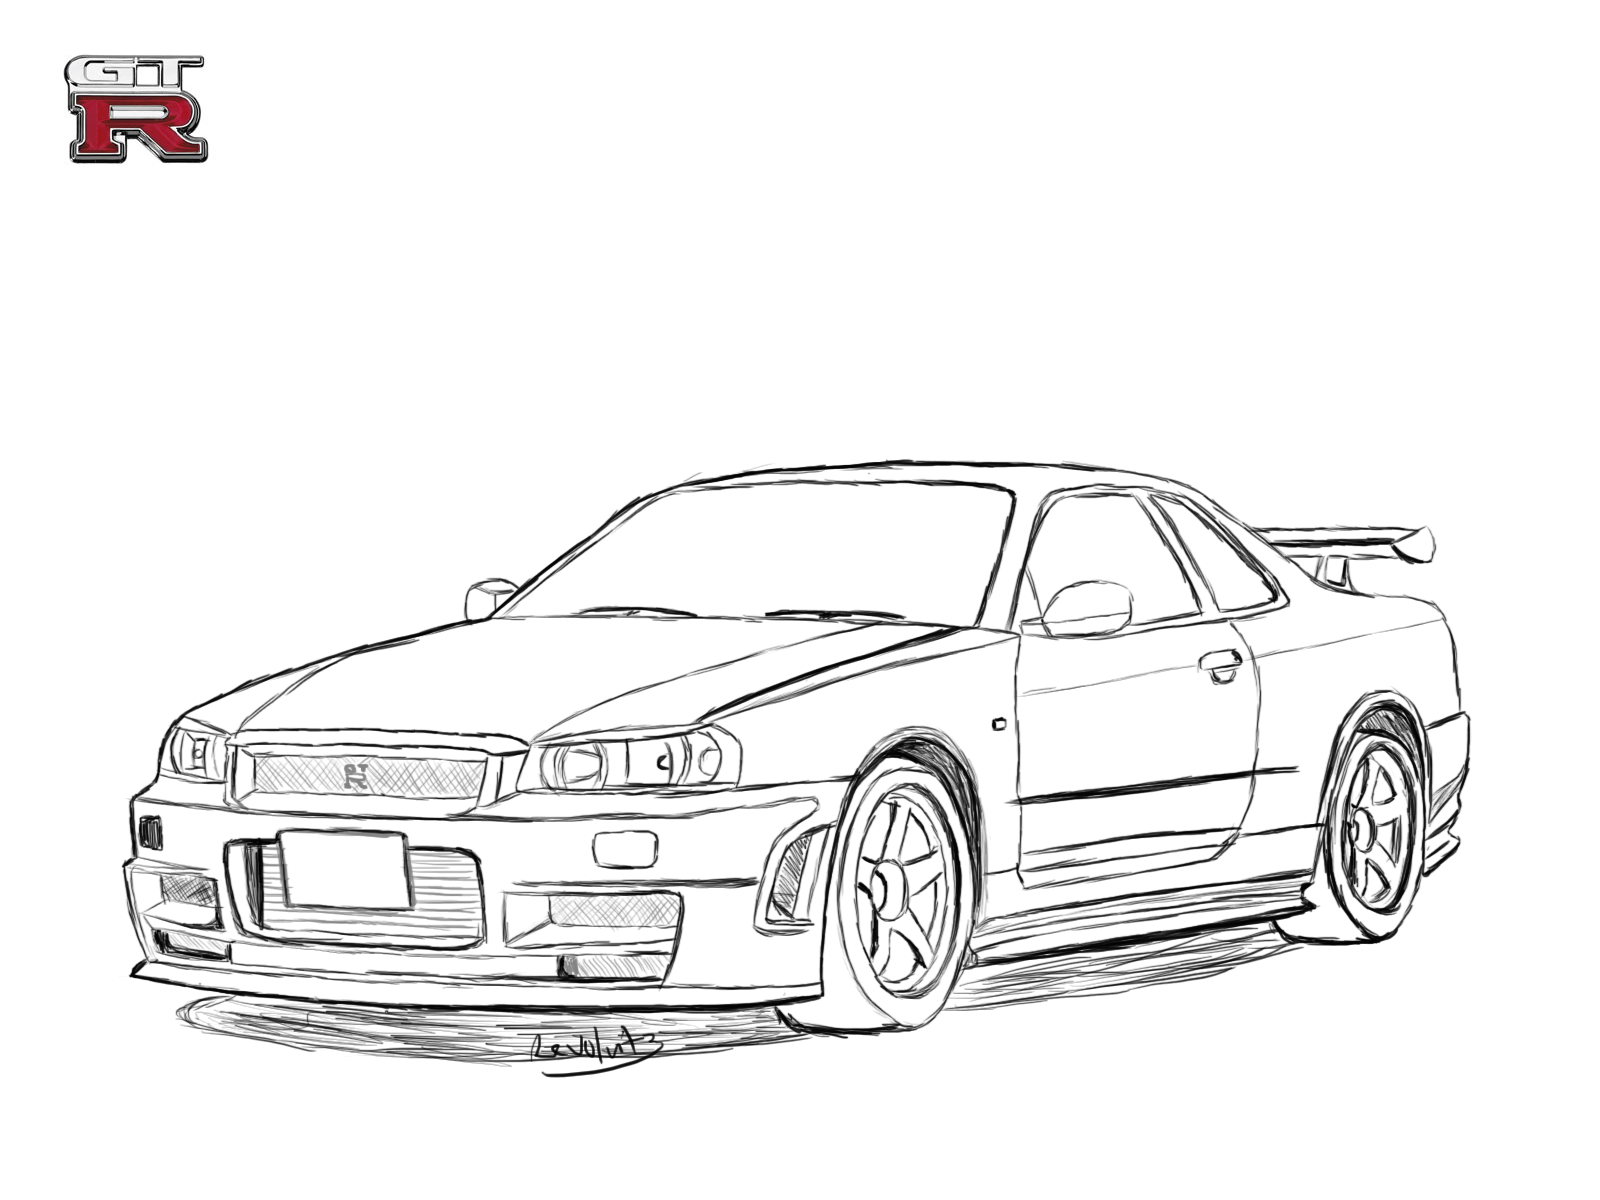 картинки по запросу Nissan Skyline Gtr R34 Drawing Idea